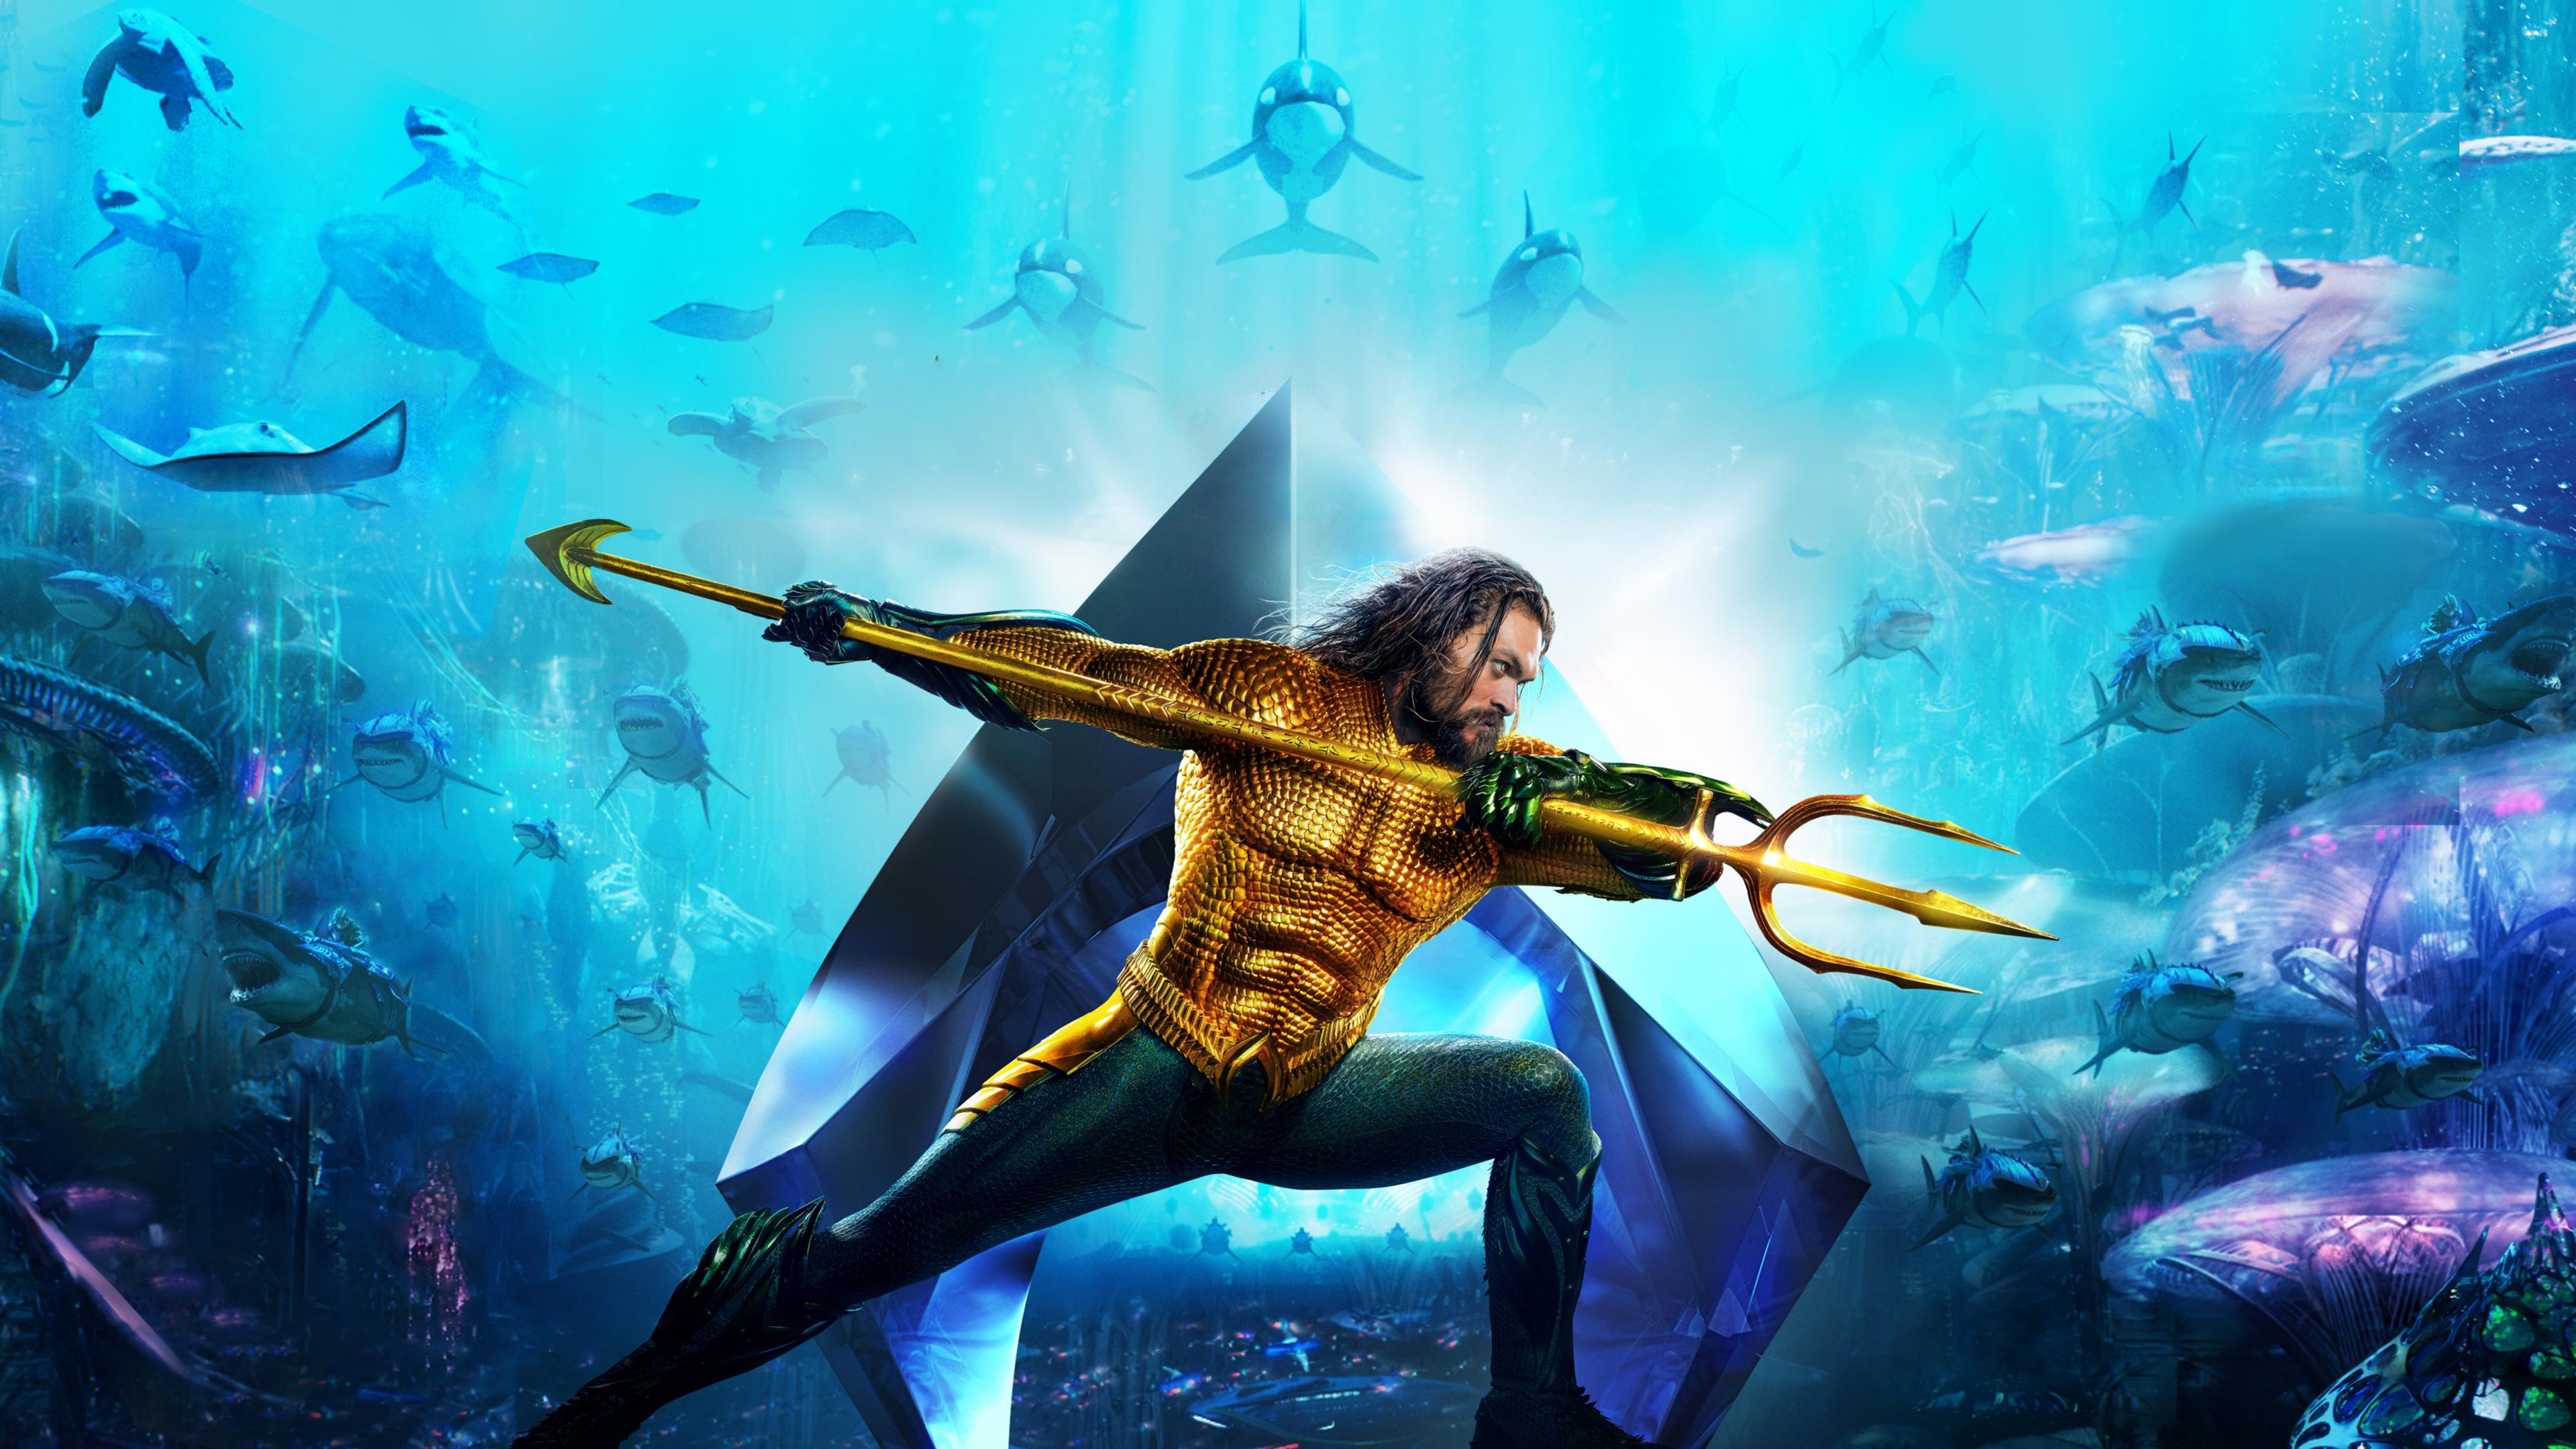 Aquaman 2018 Movie Wallpaper New Realease Movie 2018